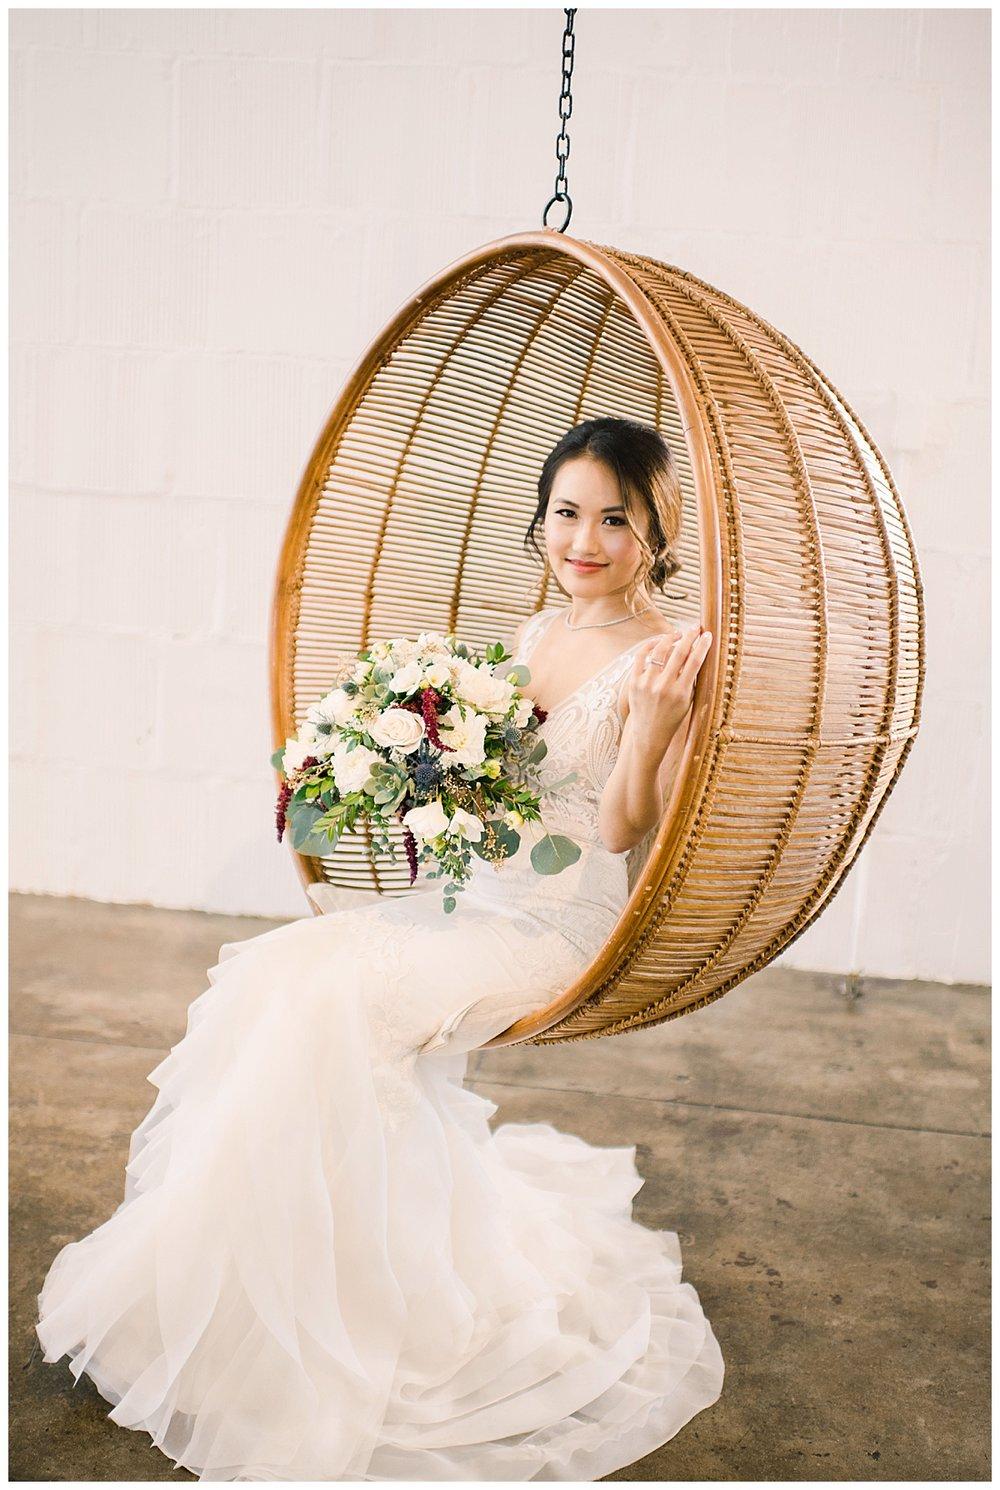 Hudson-Loft-Los-Angeles-Wedding-Photographer-Carissa-Woo-Photography_0027.jpg